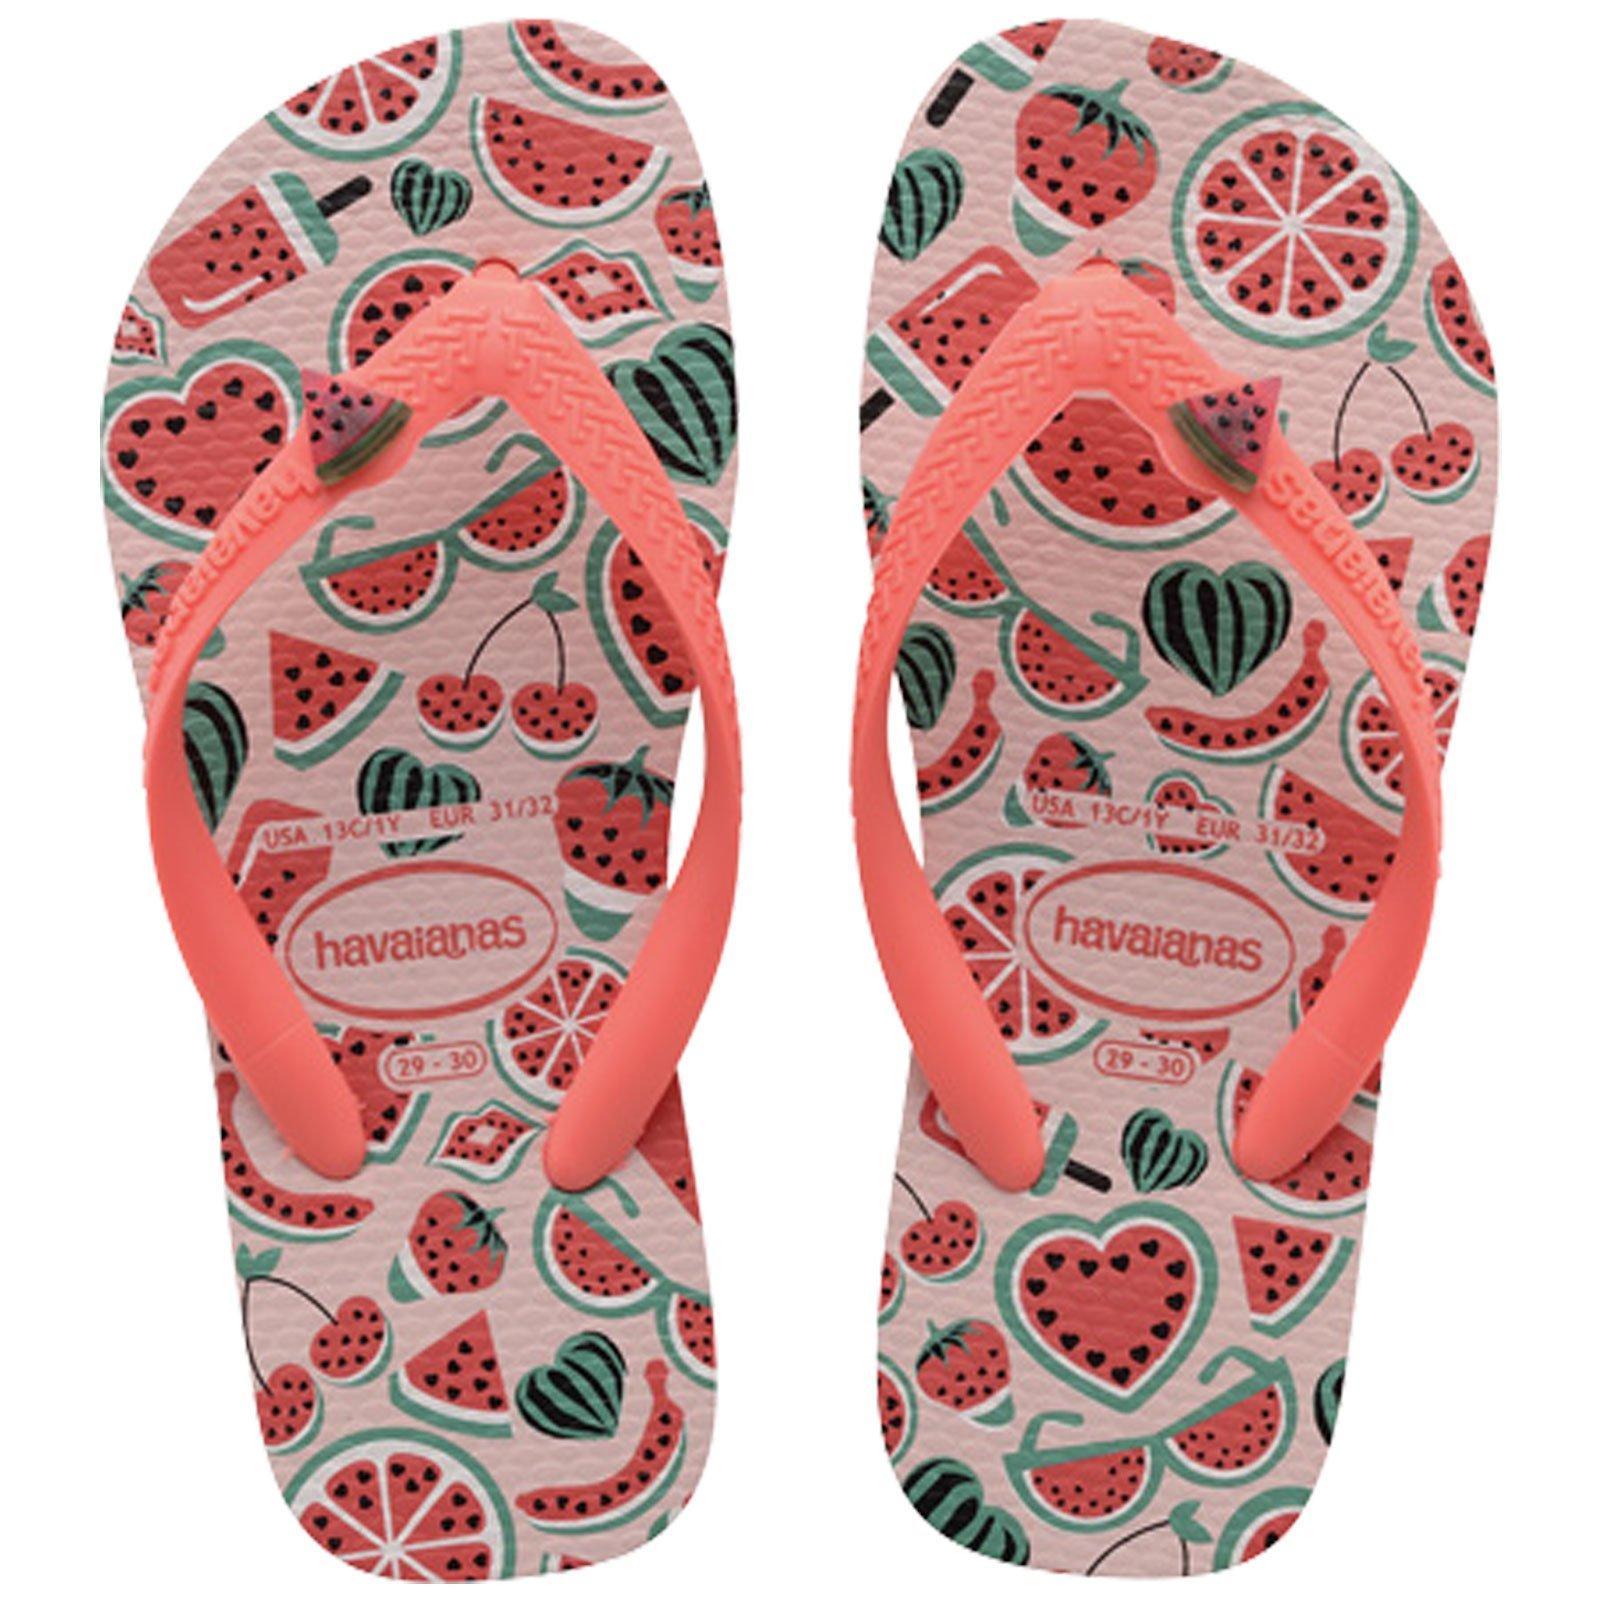 e8d548de2724e Flip-Flops Kids Fun Pearl Pink - Brand Havaianas